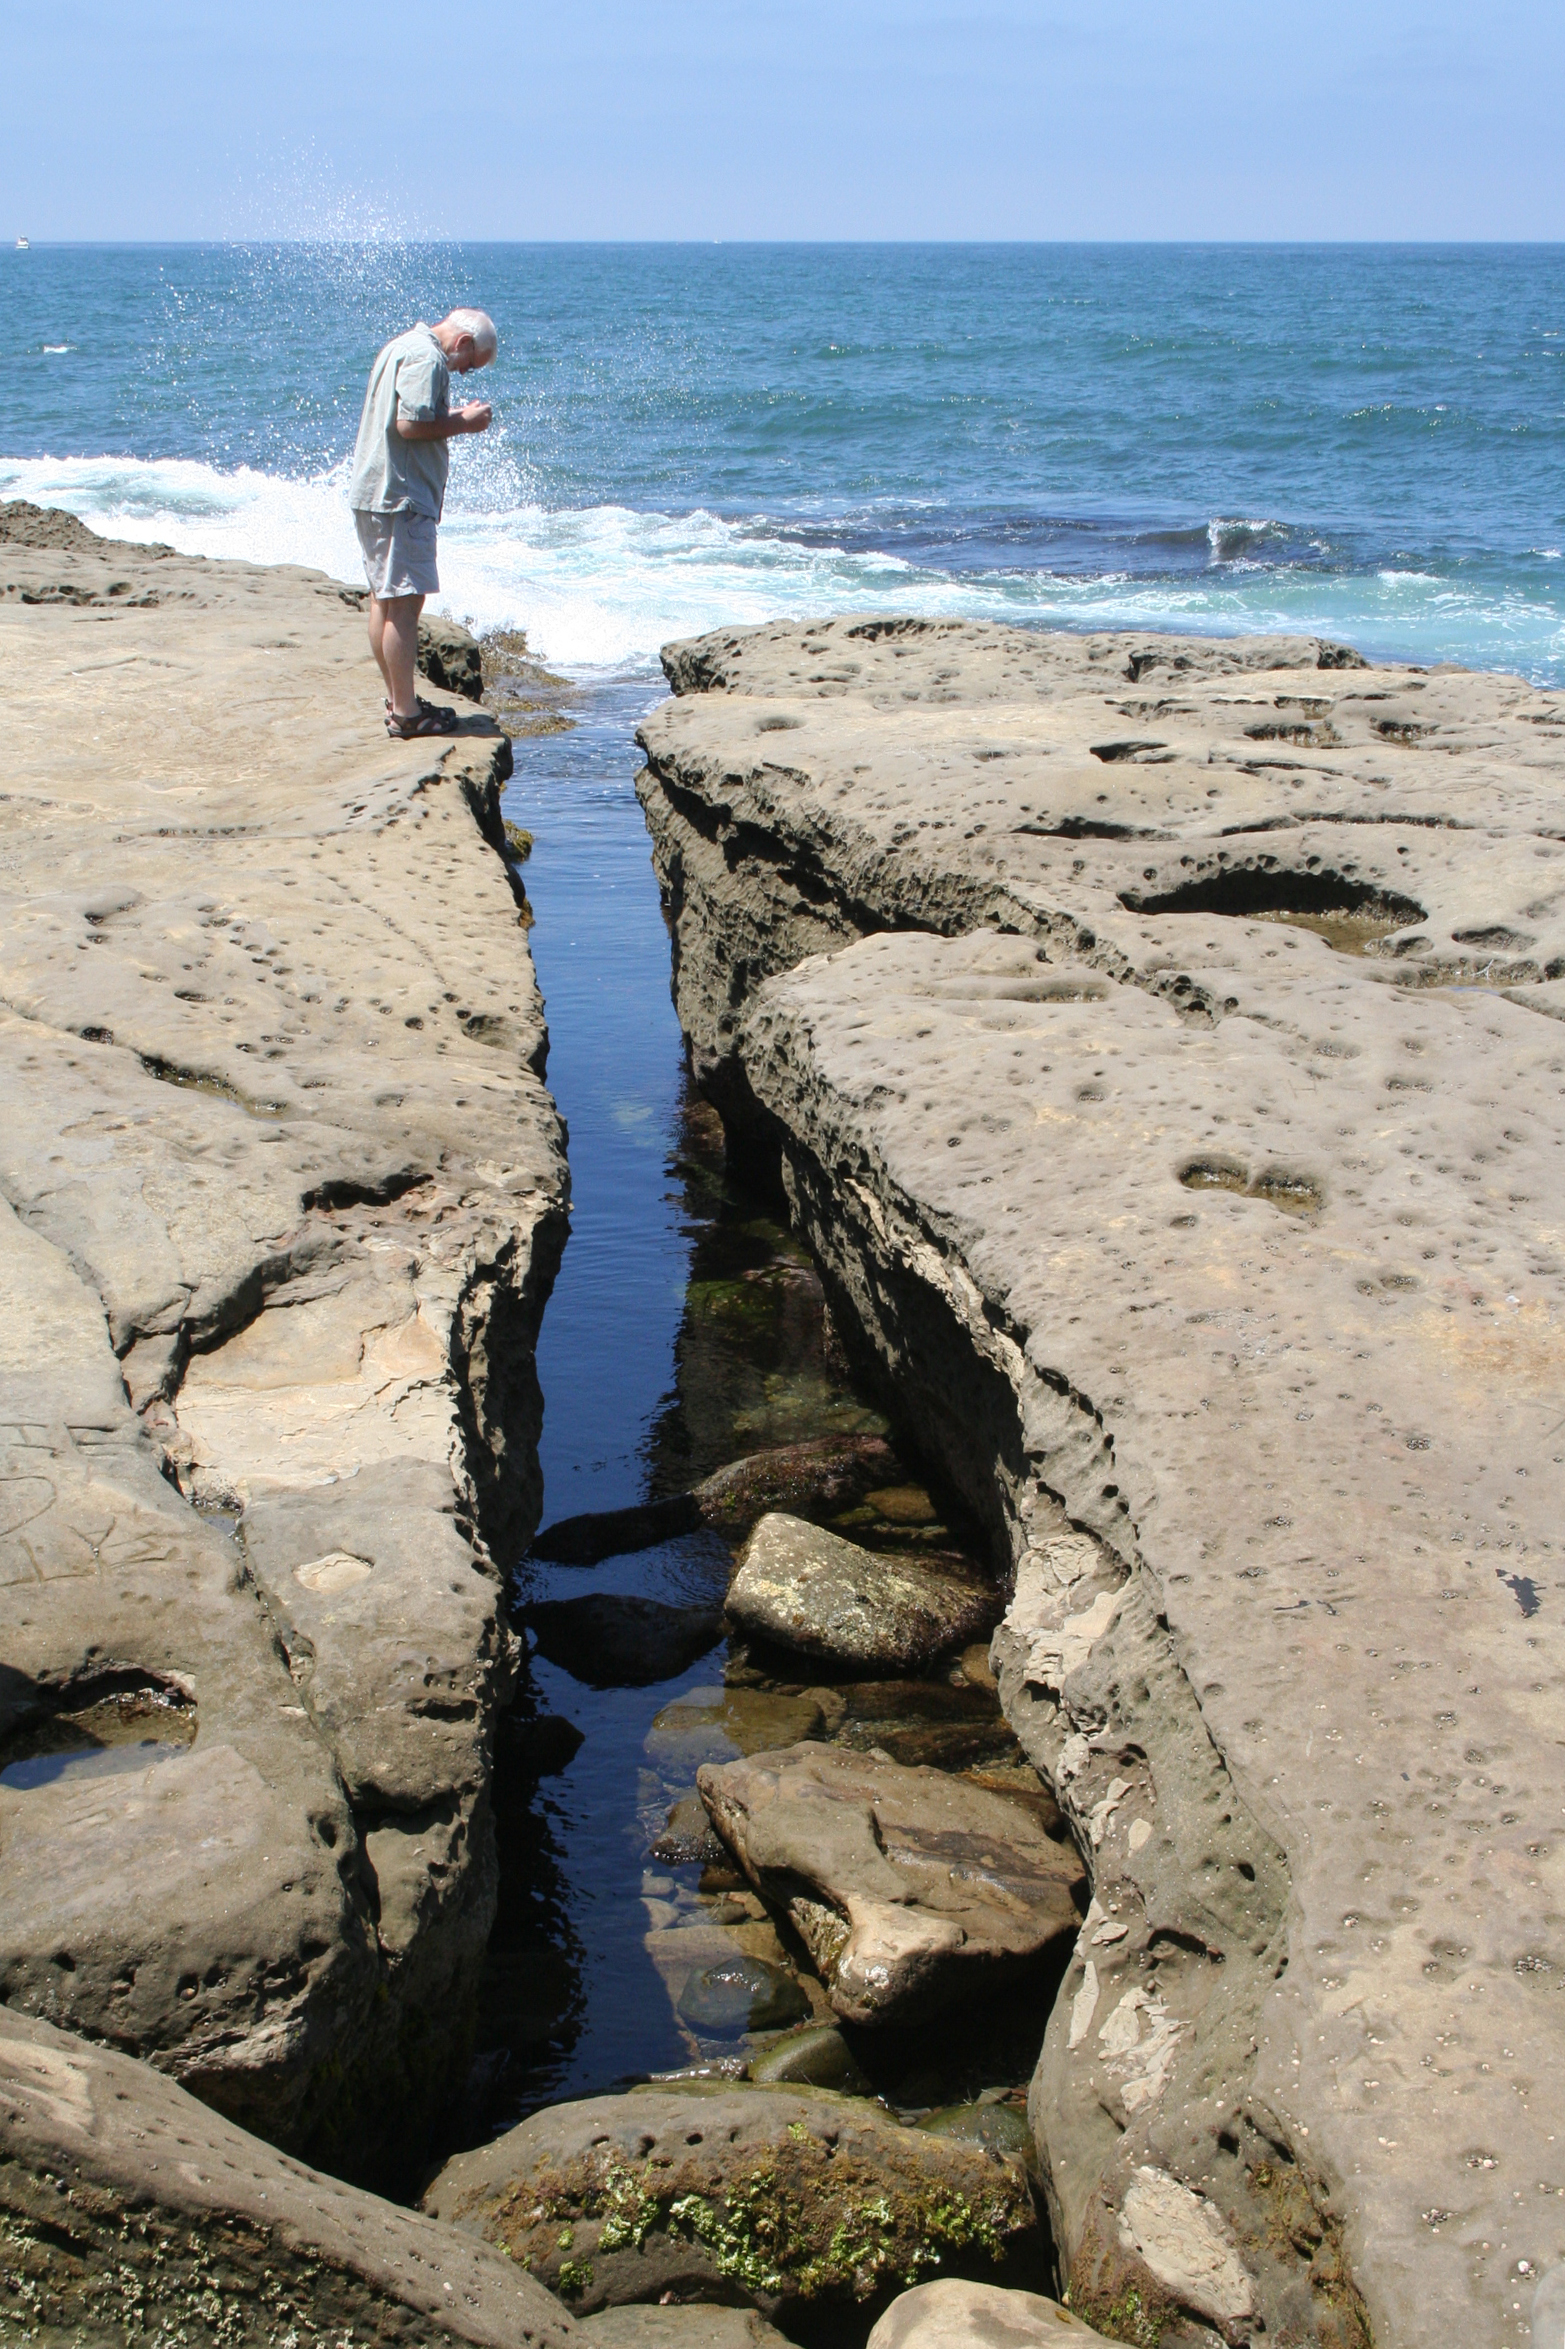 San diego 6 ocean beach for Tides for fishing san diego